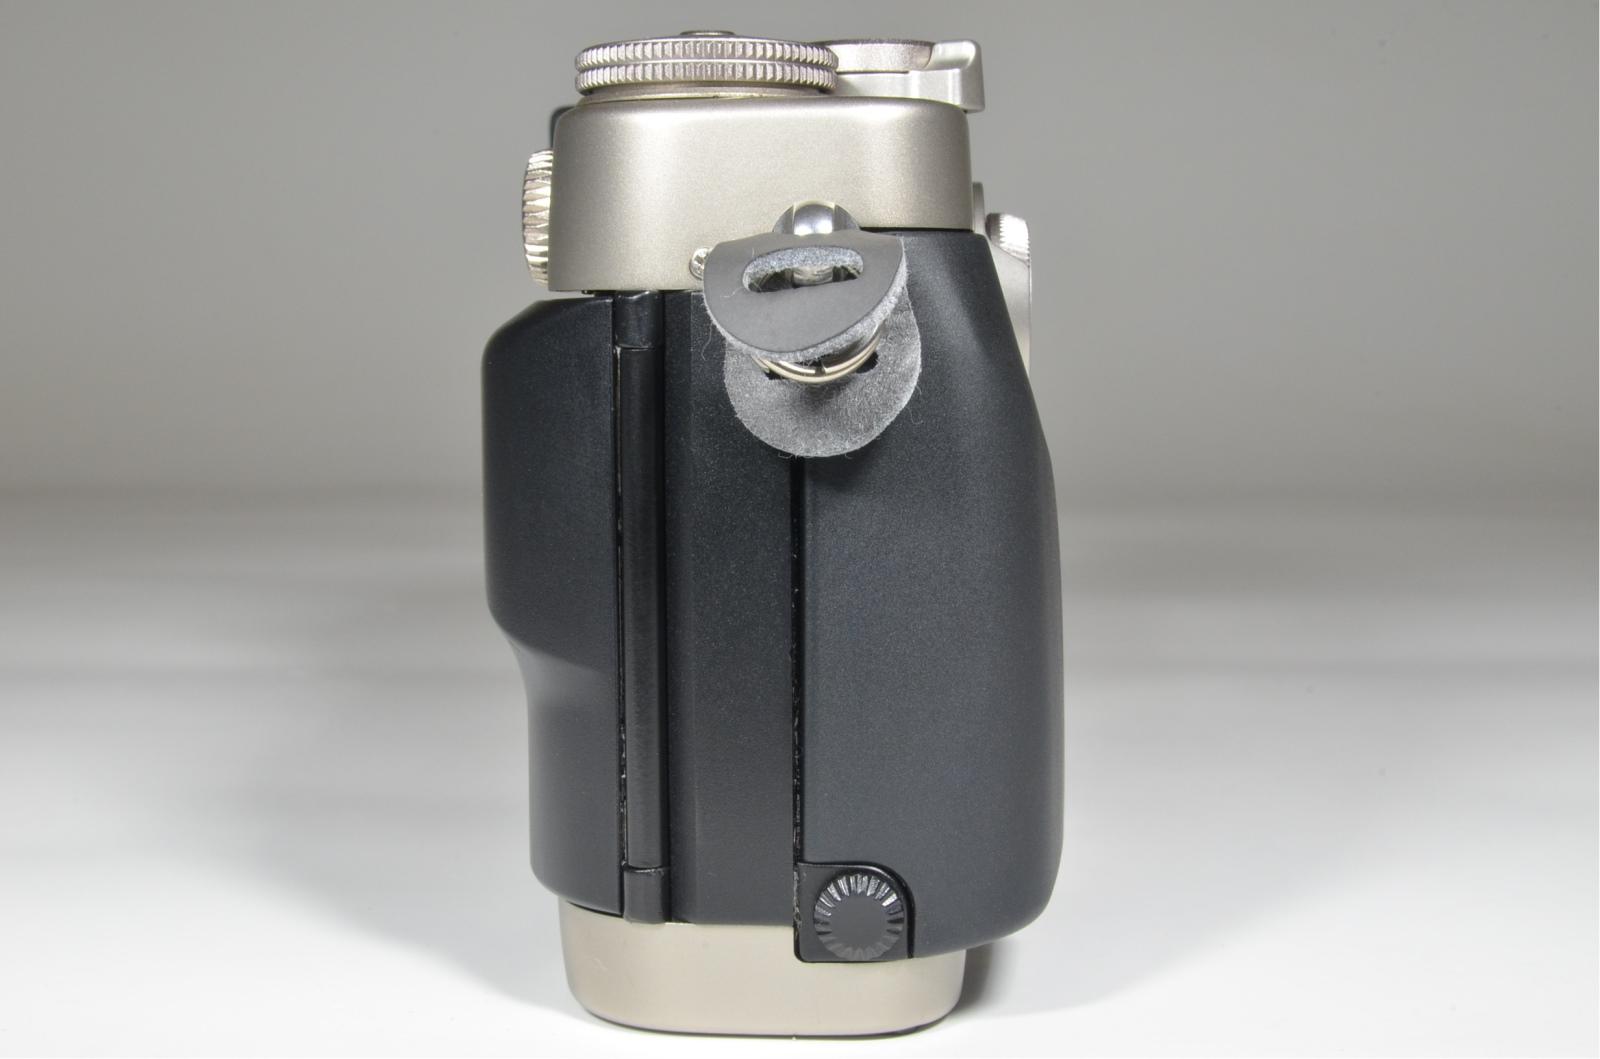 contax g2 35mm film camera, planar 45mm f2, tla200